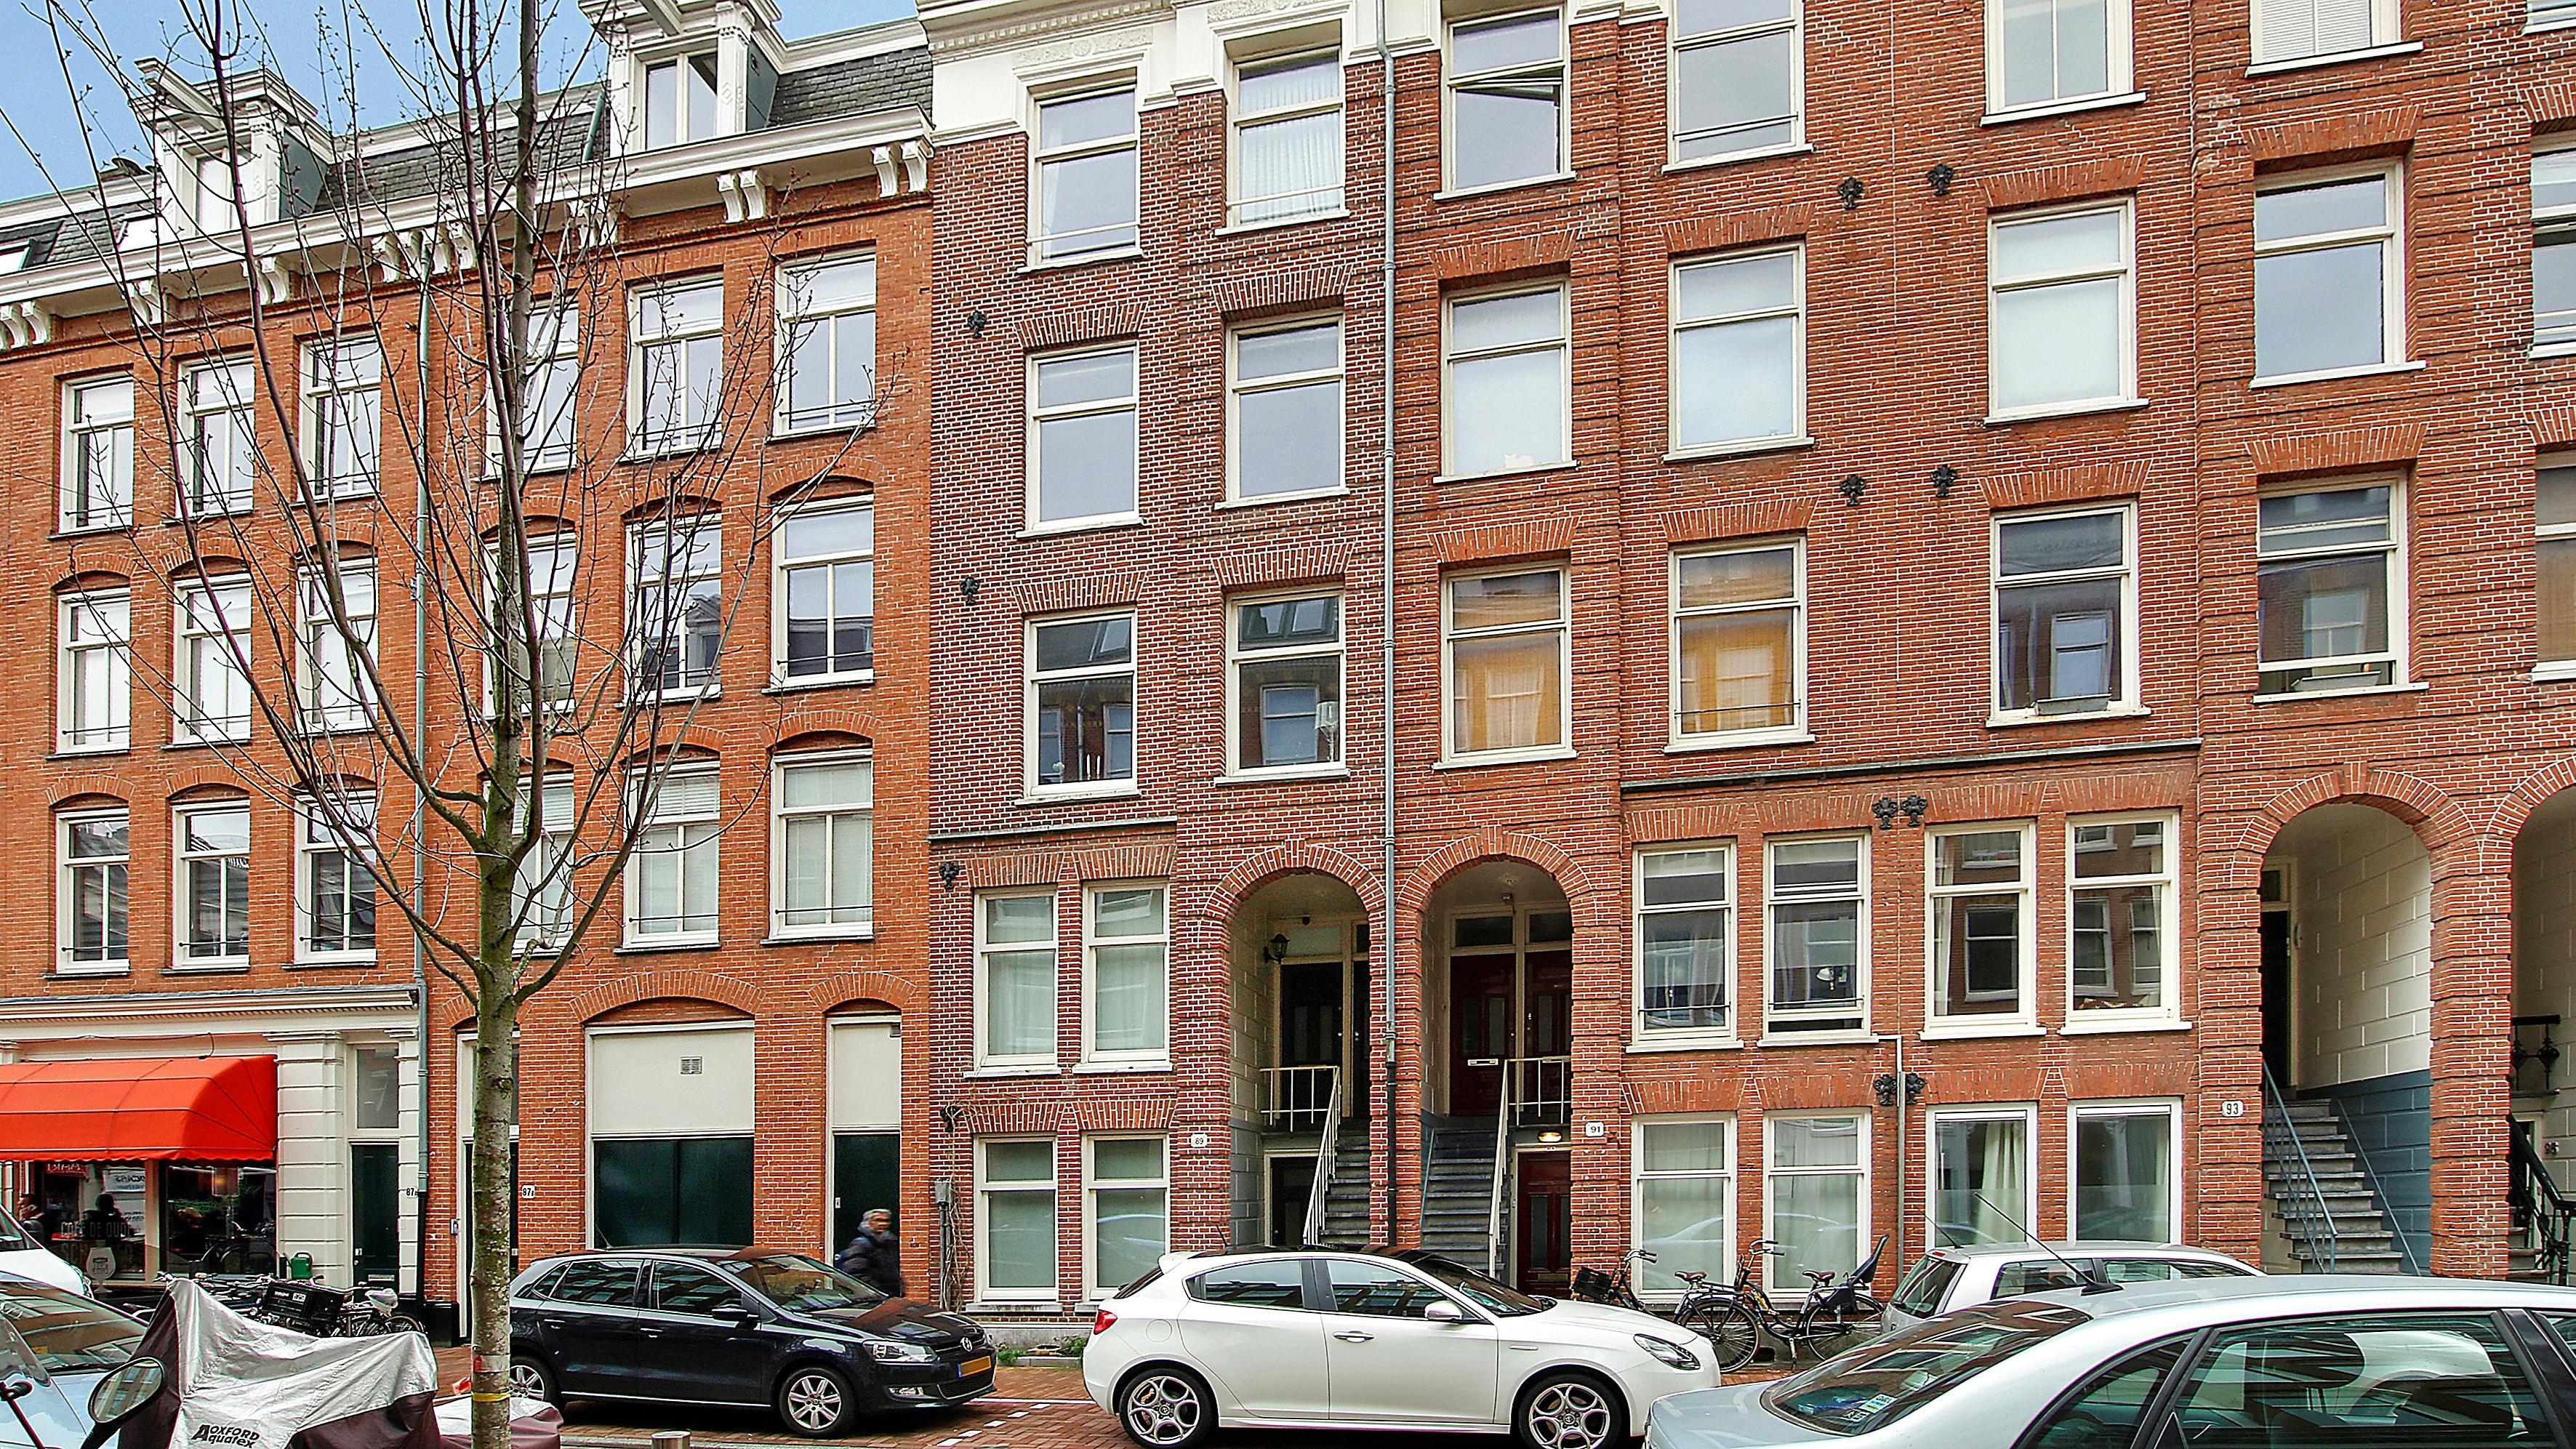 Onder bod: Van Oldenbarneveldtstraat 89-3, 1052 JX Amsterdam